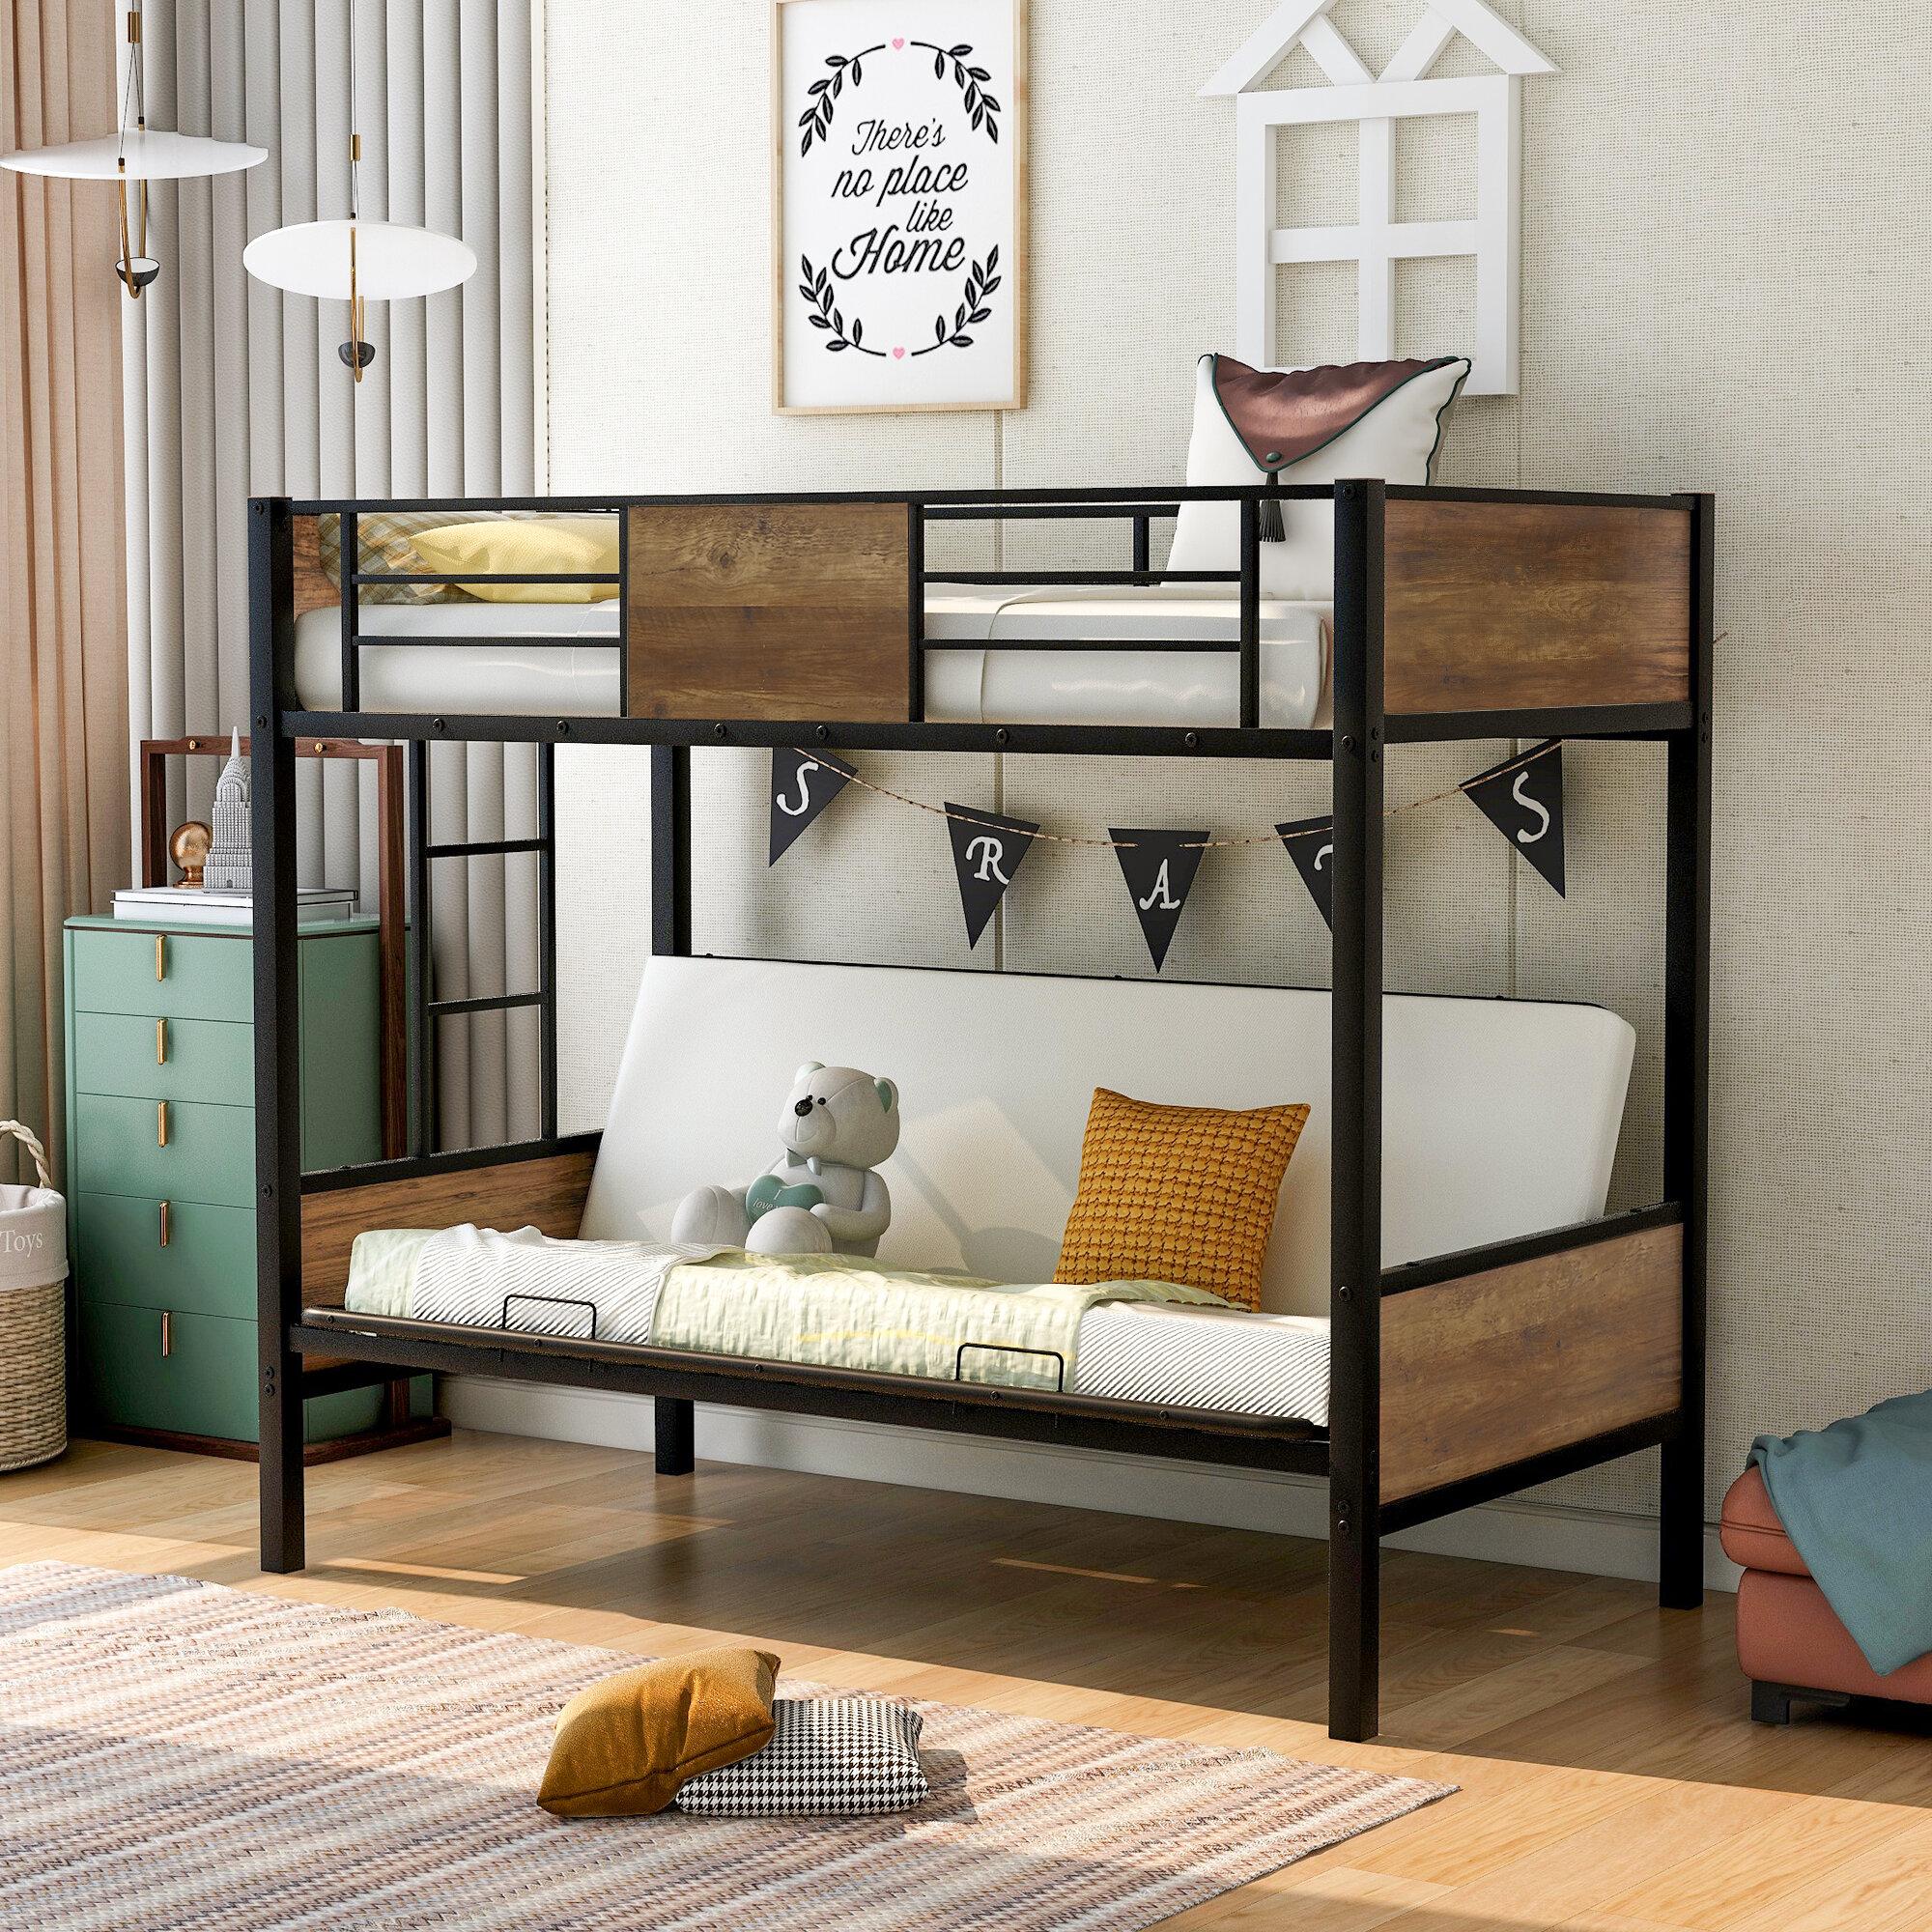 Futon Bunk Beds You Ll Love In 2021 Wayfair